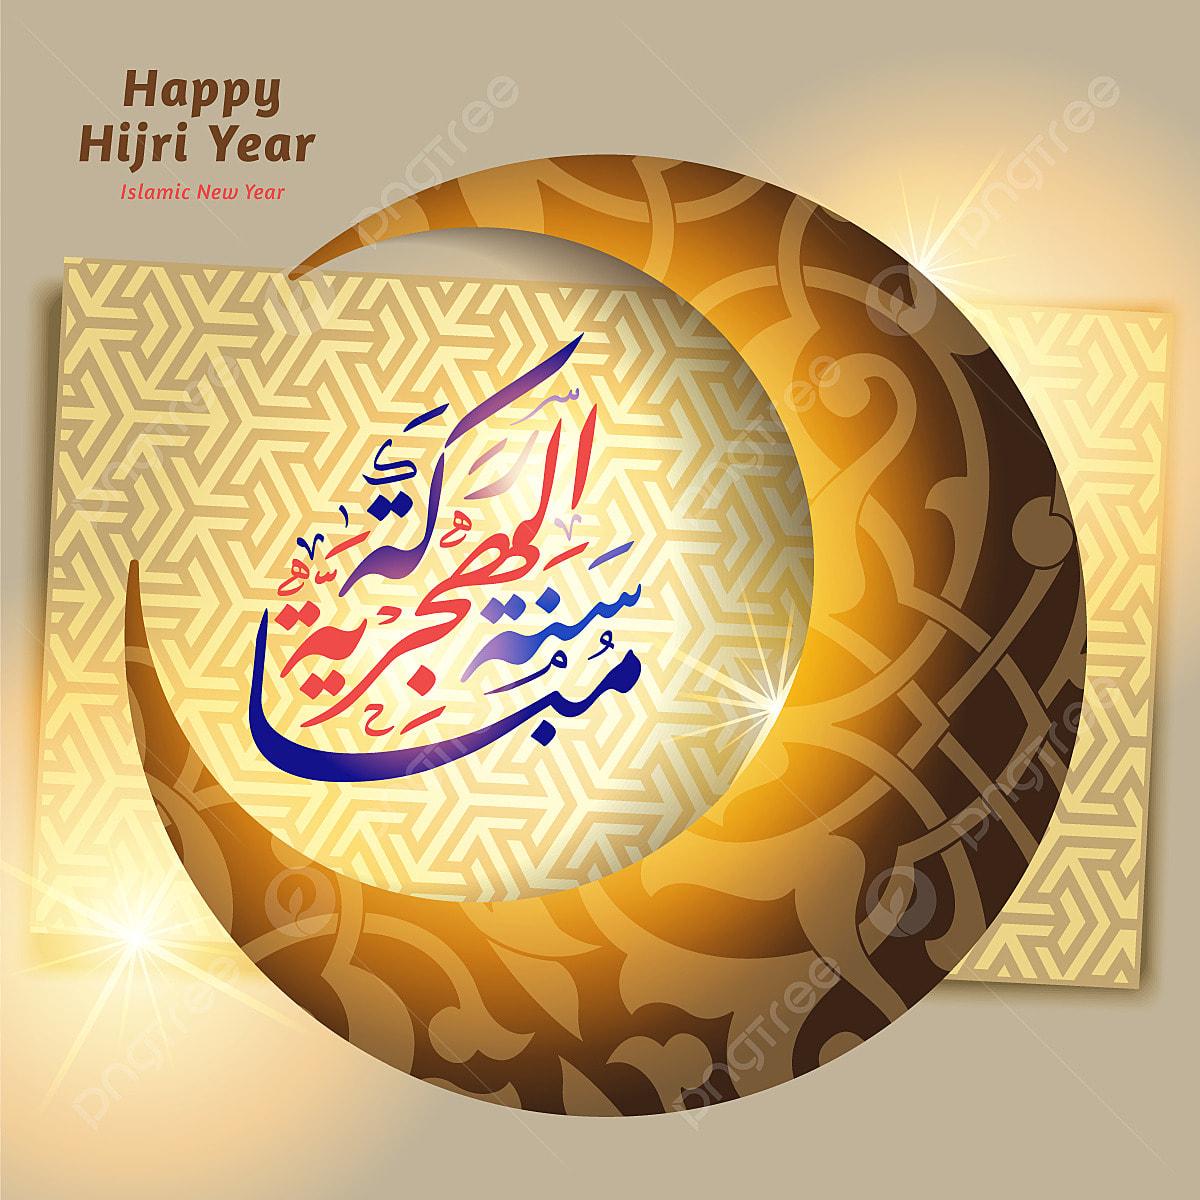 Crescent Moon Elements On Arabic Ornament Background  Happy Hijri